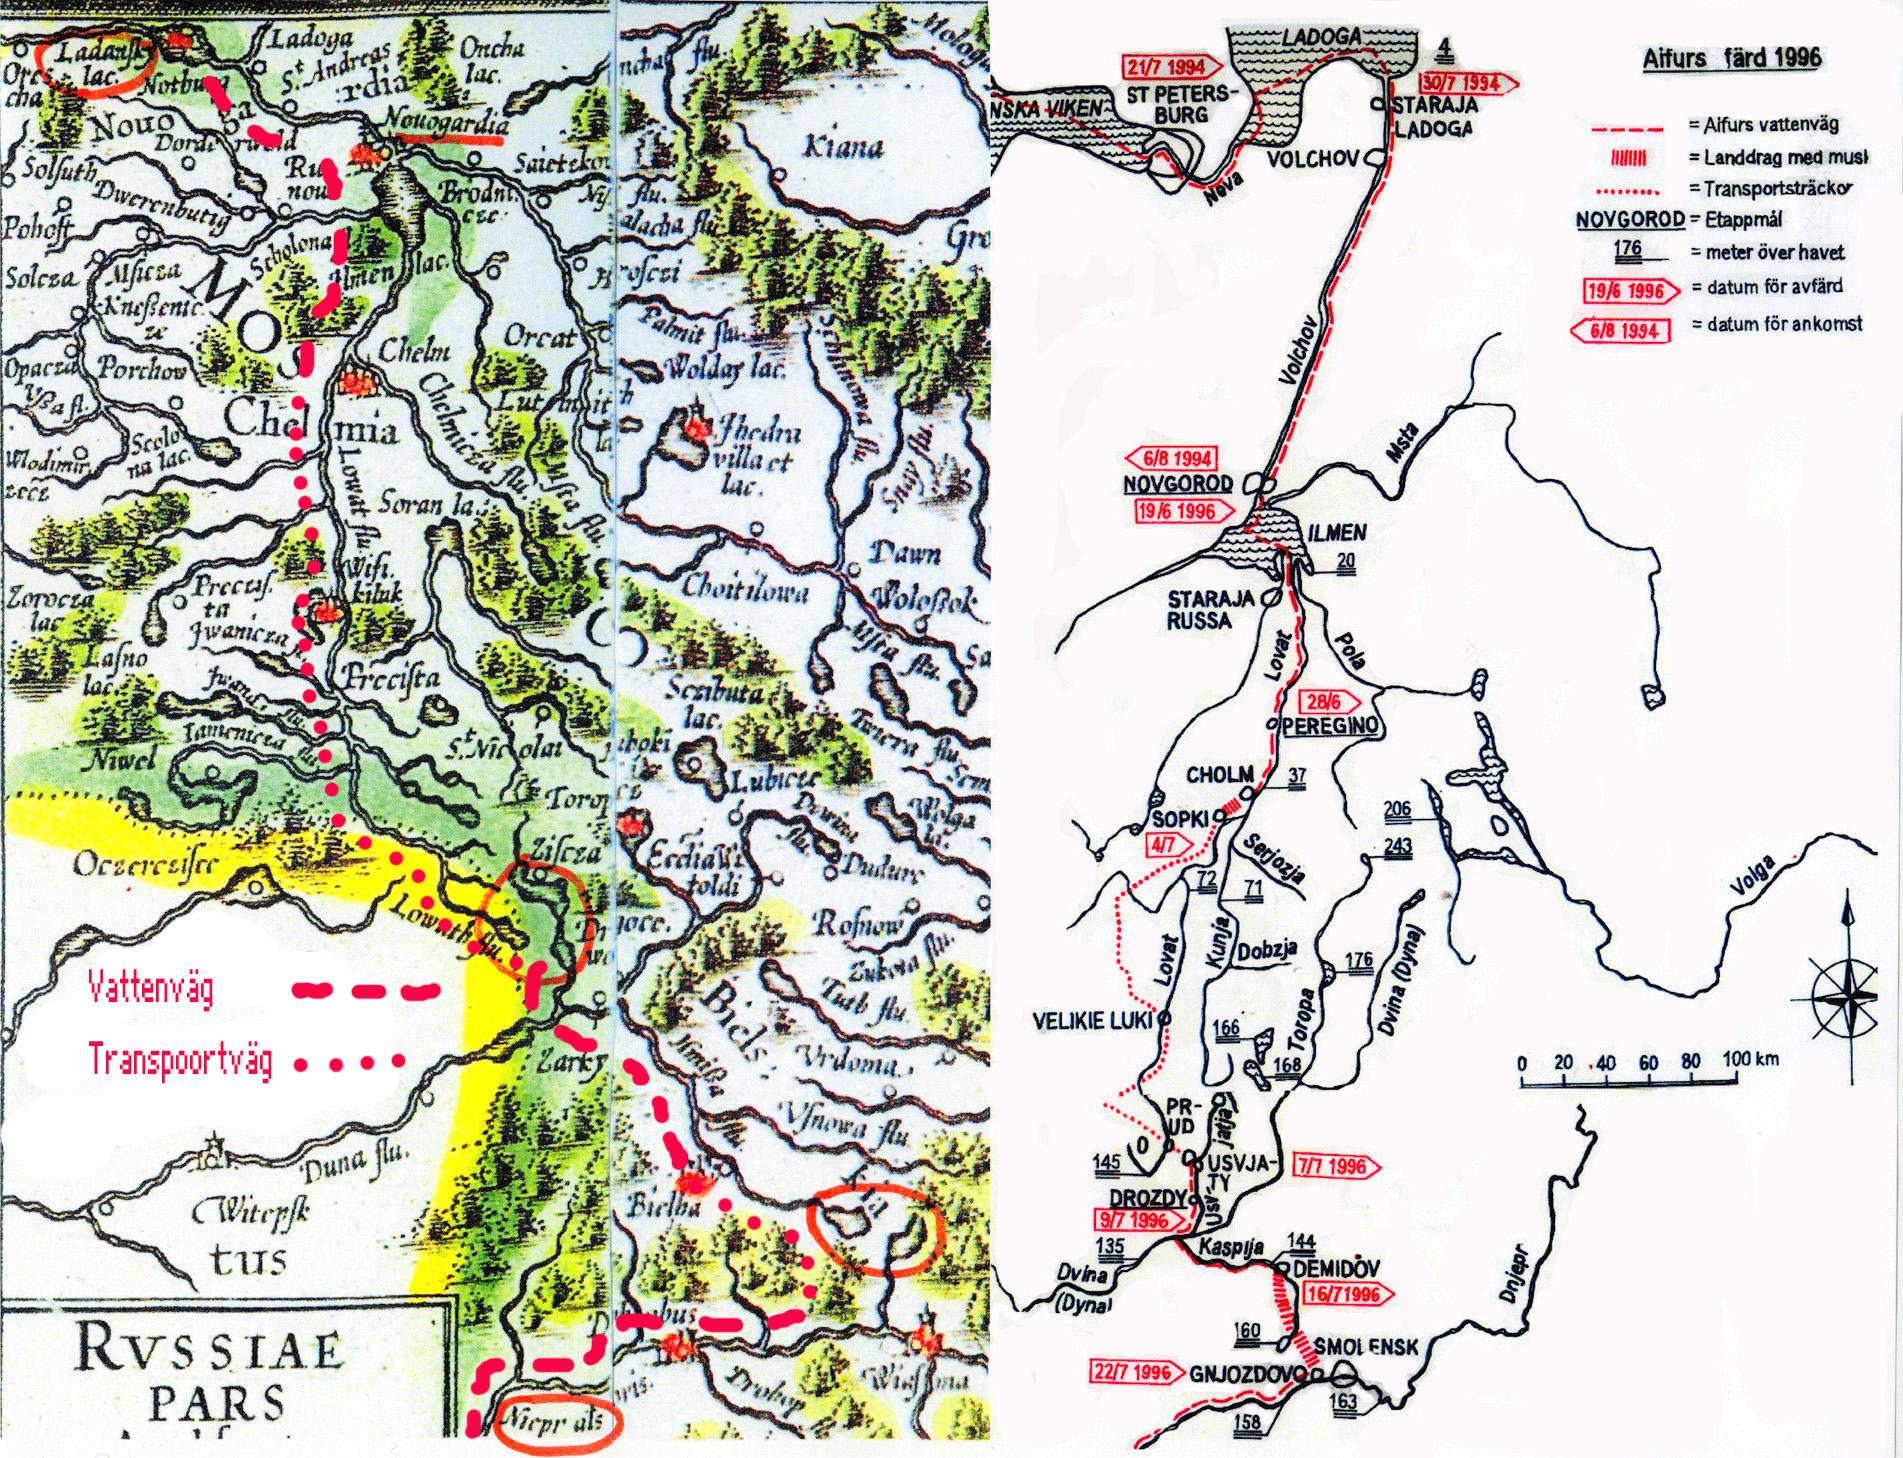 Karta Over Varldens Bergskedjor.Kommentarer Till Gamla Kartor